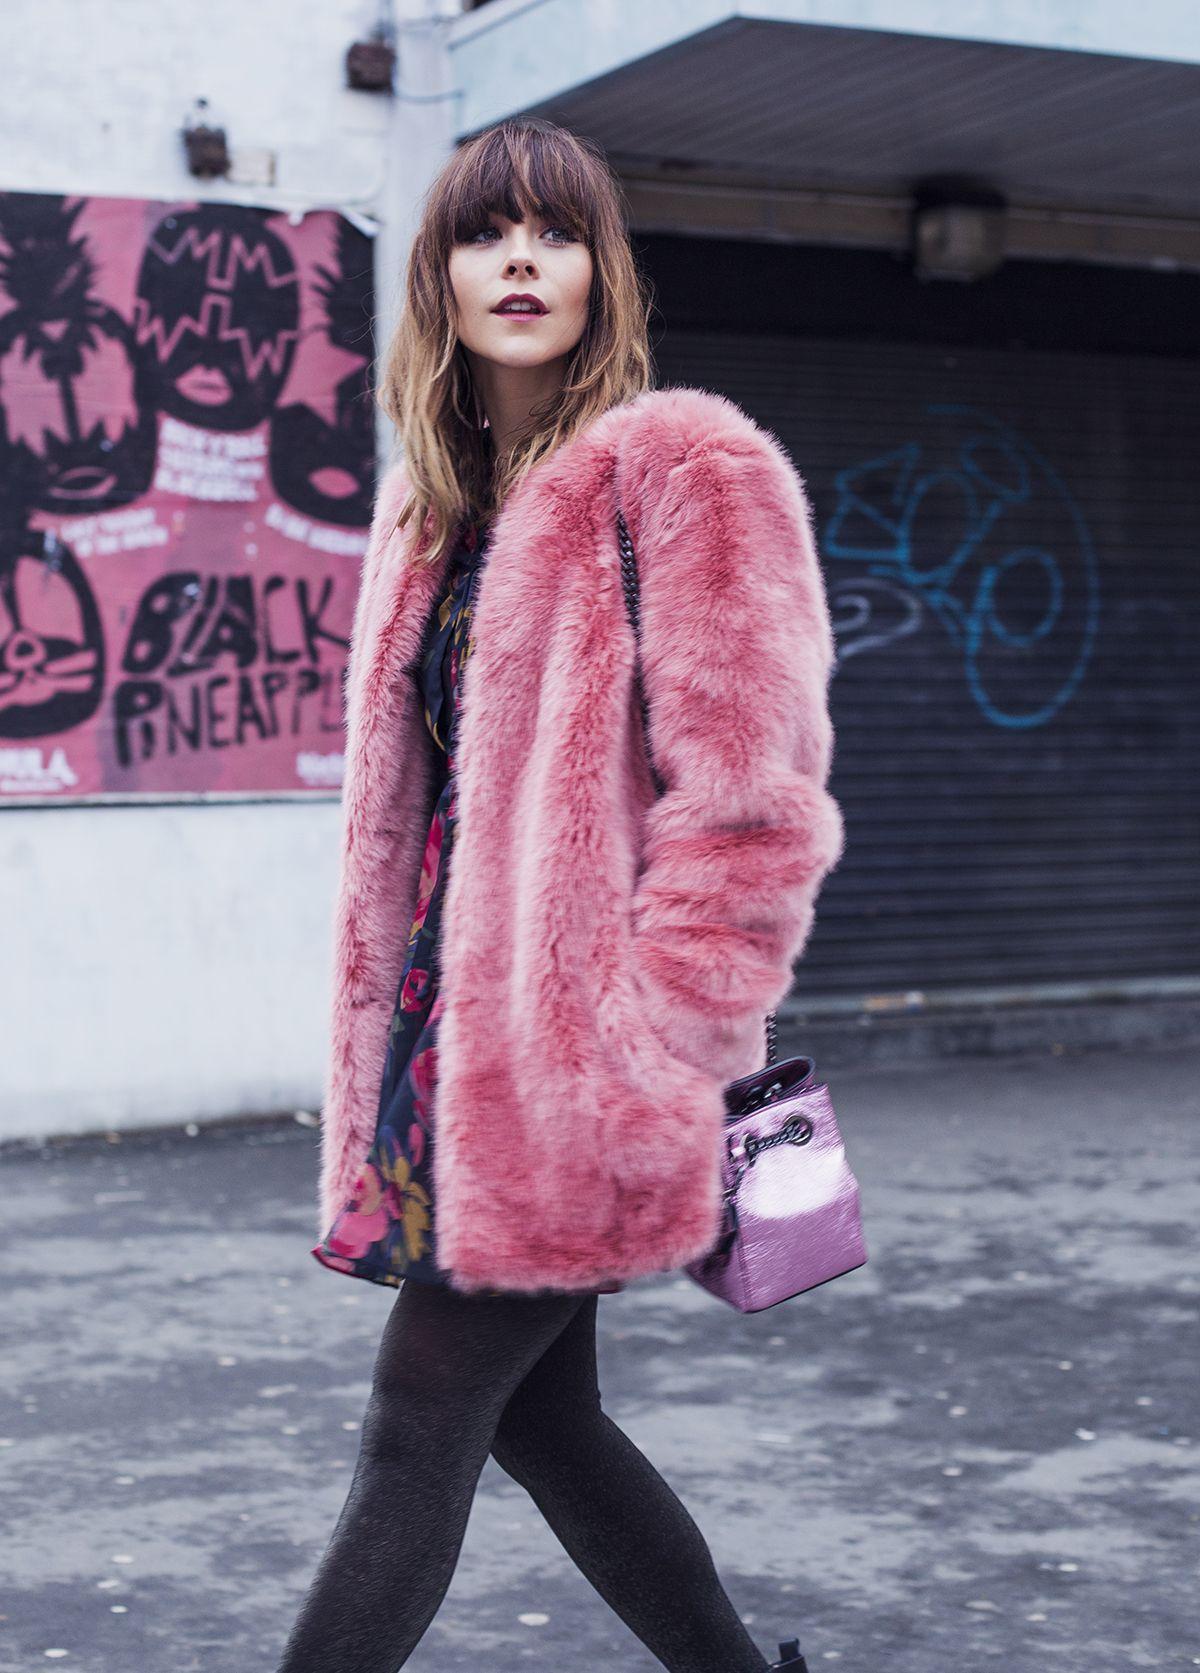 Our Favorite Faux Fur Coats Fall Fashion Coats Colorful Faux Fur Coat Pink Faux Fur Coat [ 1673 x 1200 Pixel ]